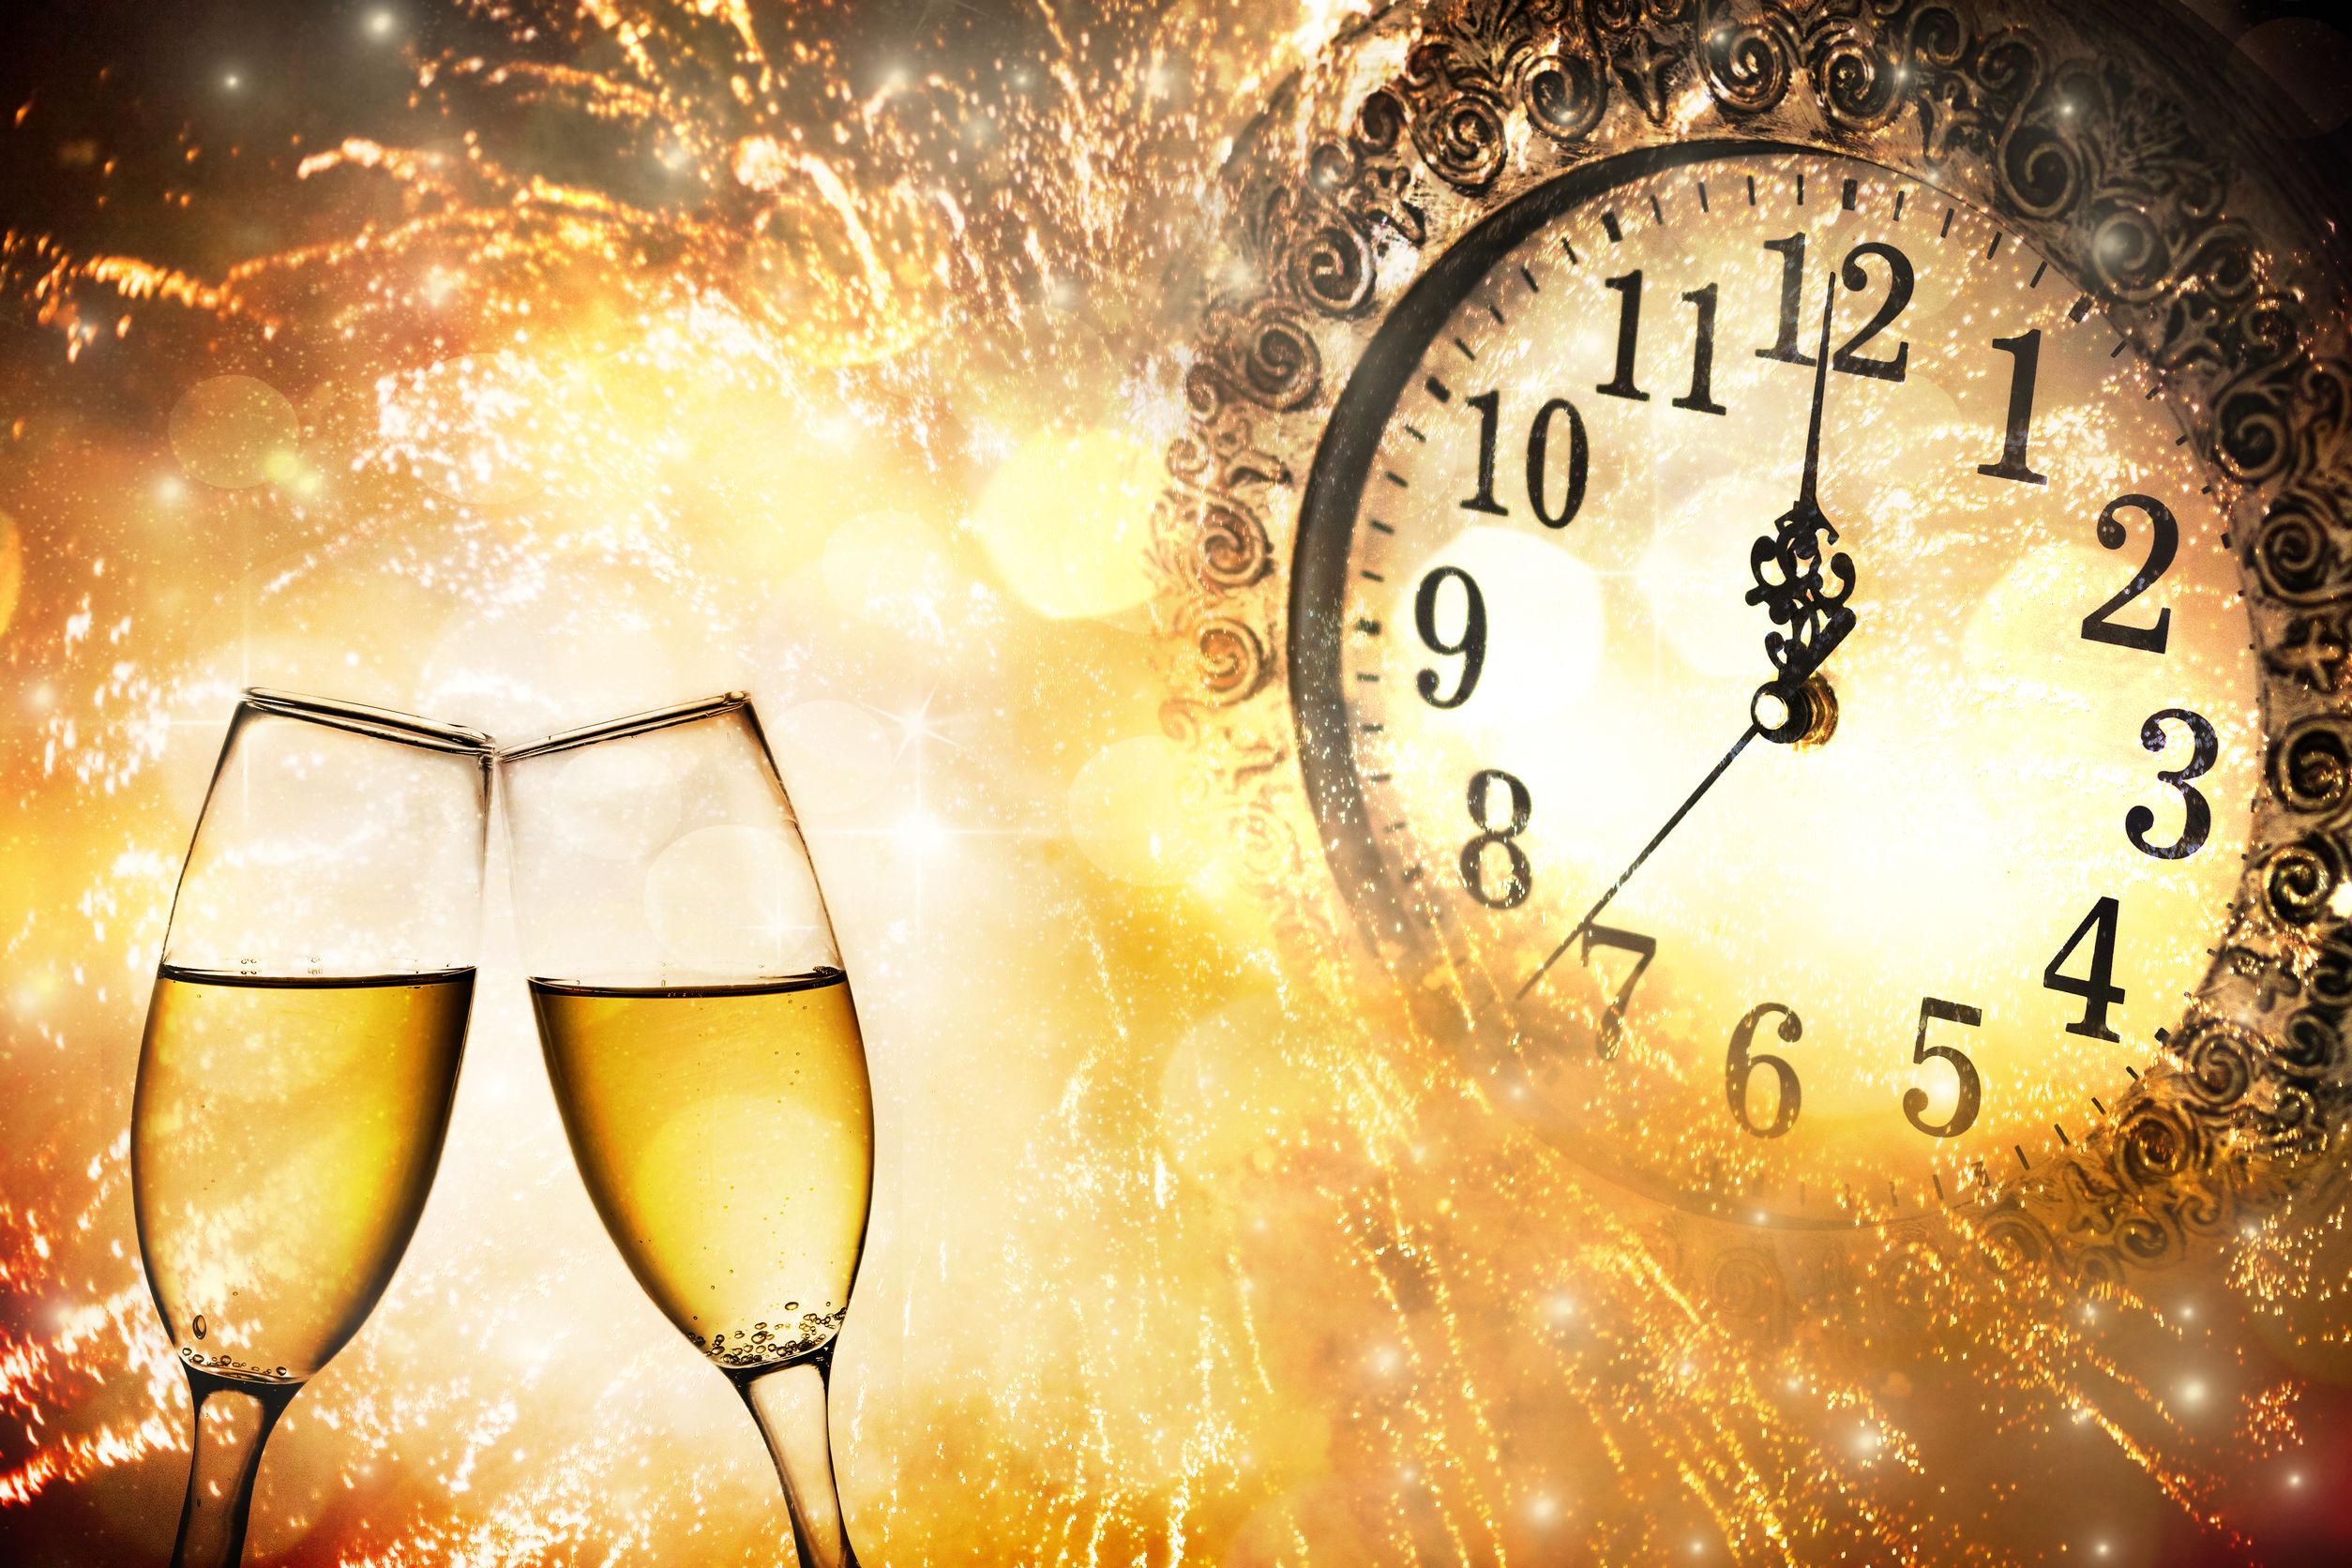 Poolnova os desea un feliz año nuevo 2019